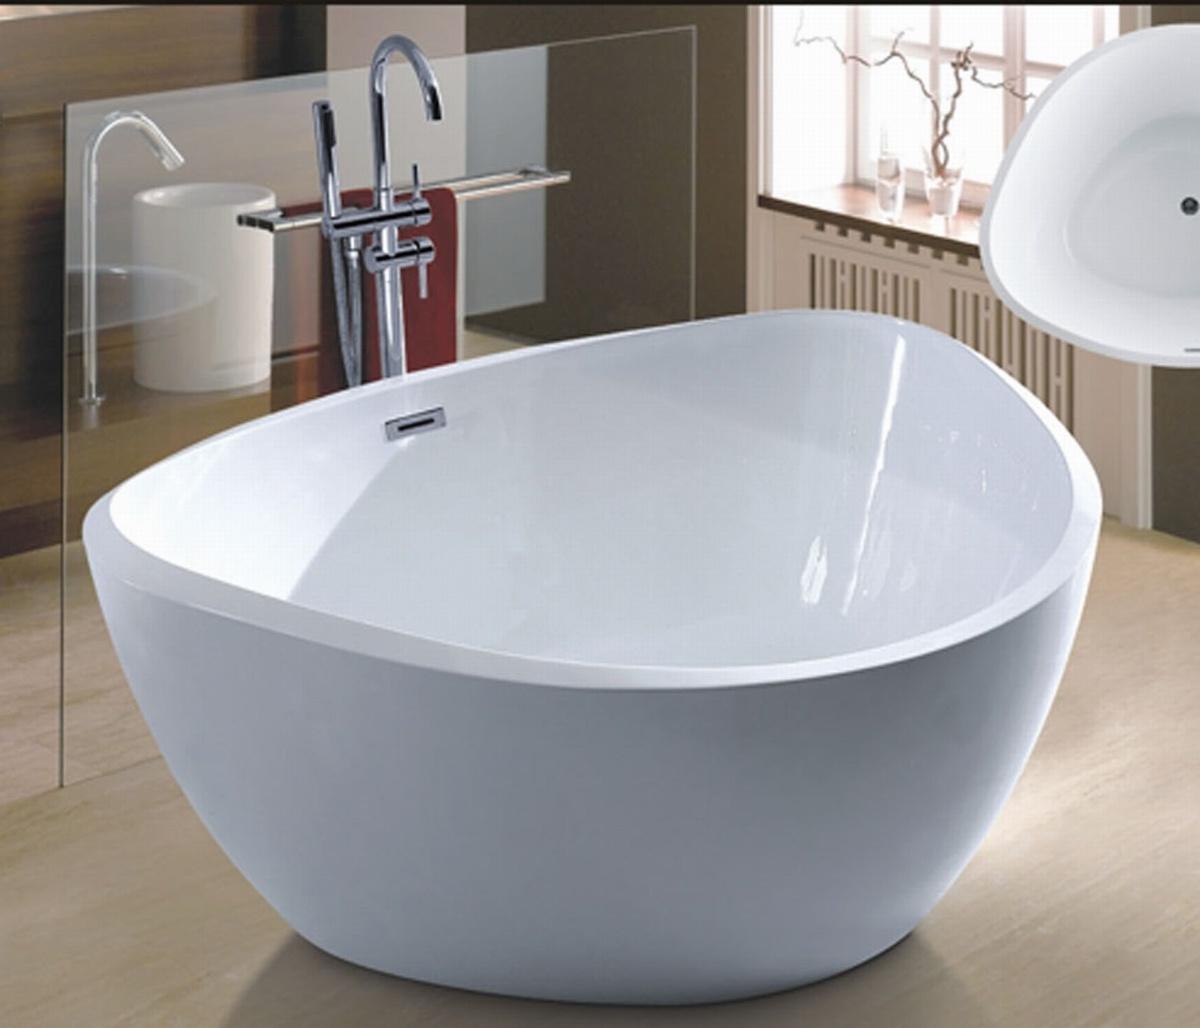 China New Triangle Freestanding Bathtub SPA for Villa (AT-6020 ...